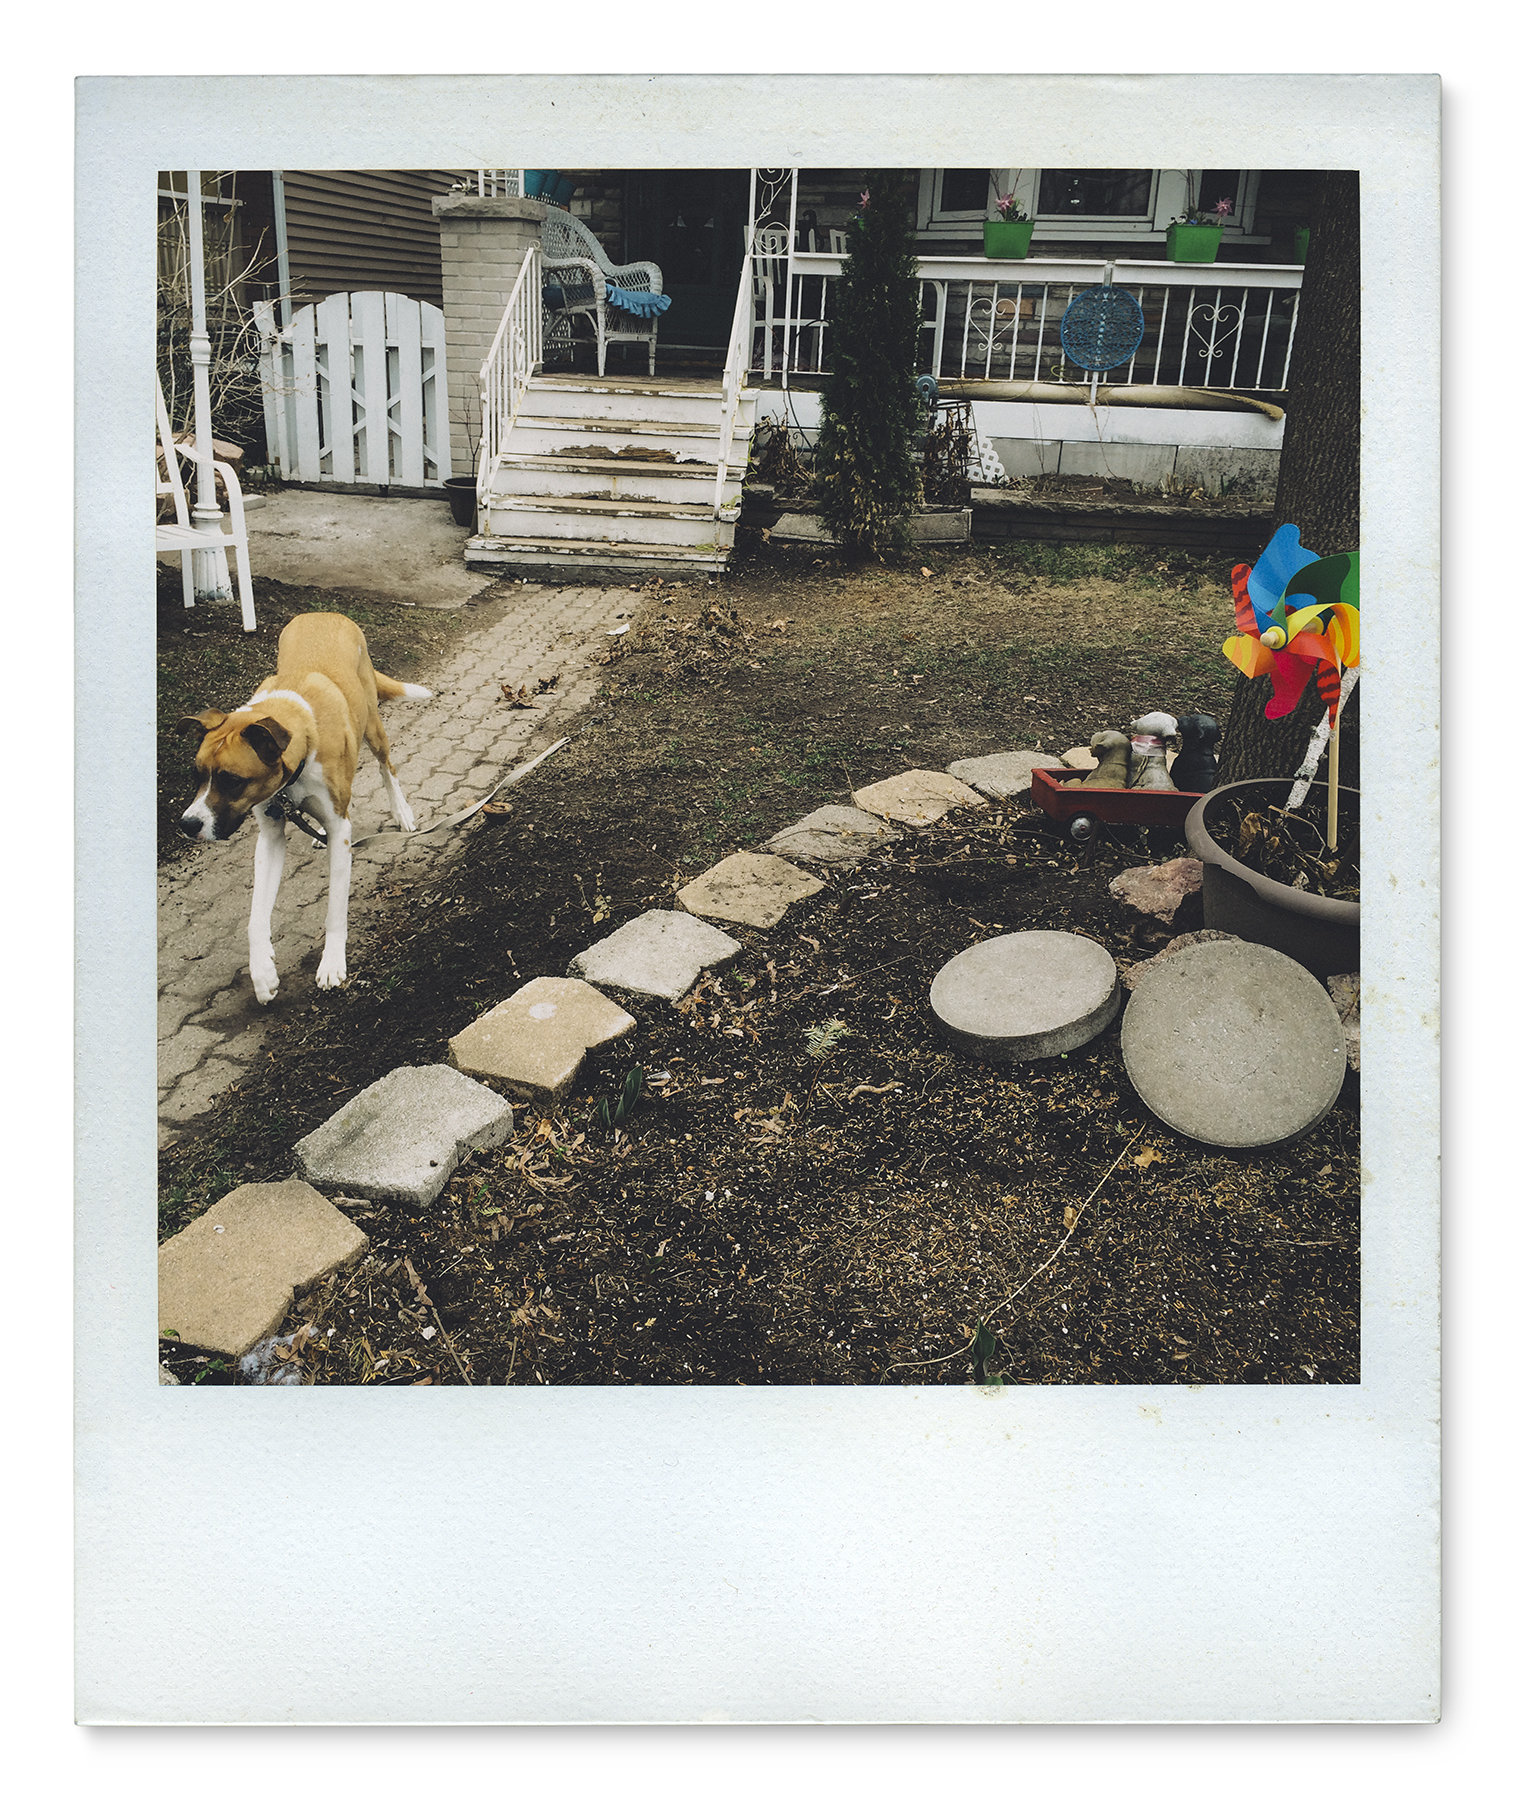 065_Polaroid SX70_IMG_8278.jpg